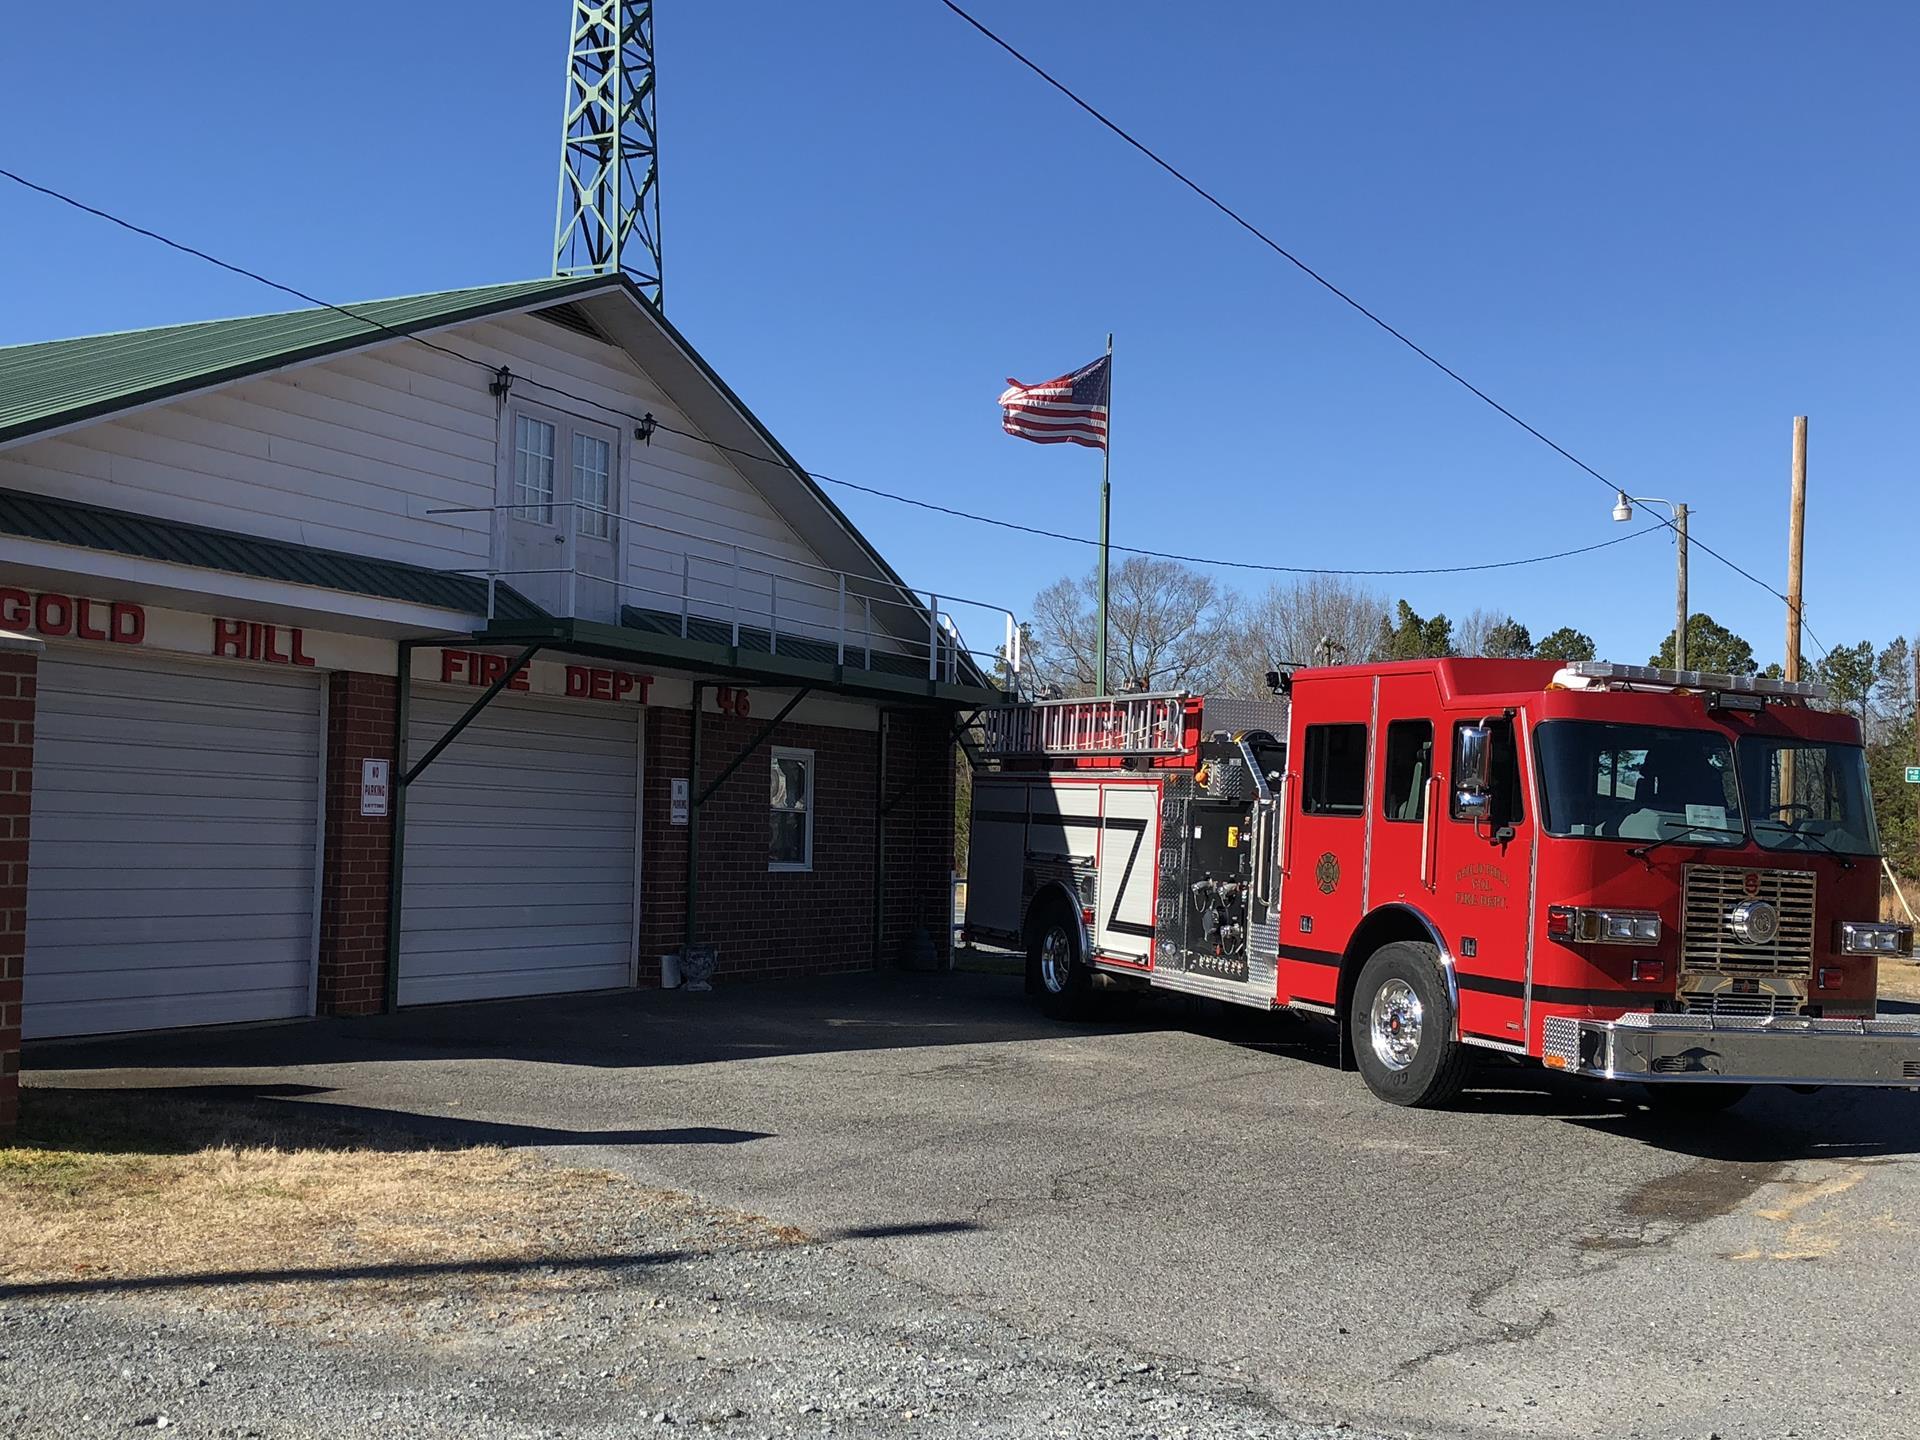 East Gold Hill Fire Department